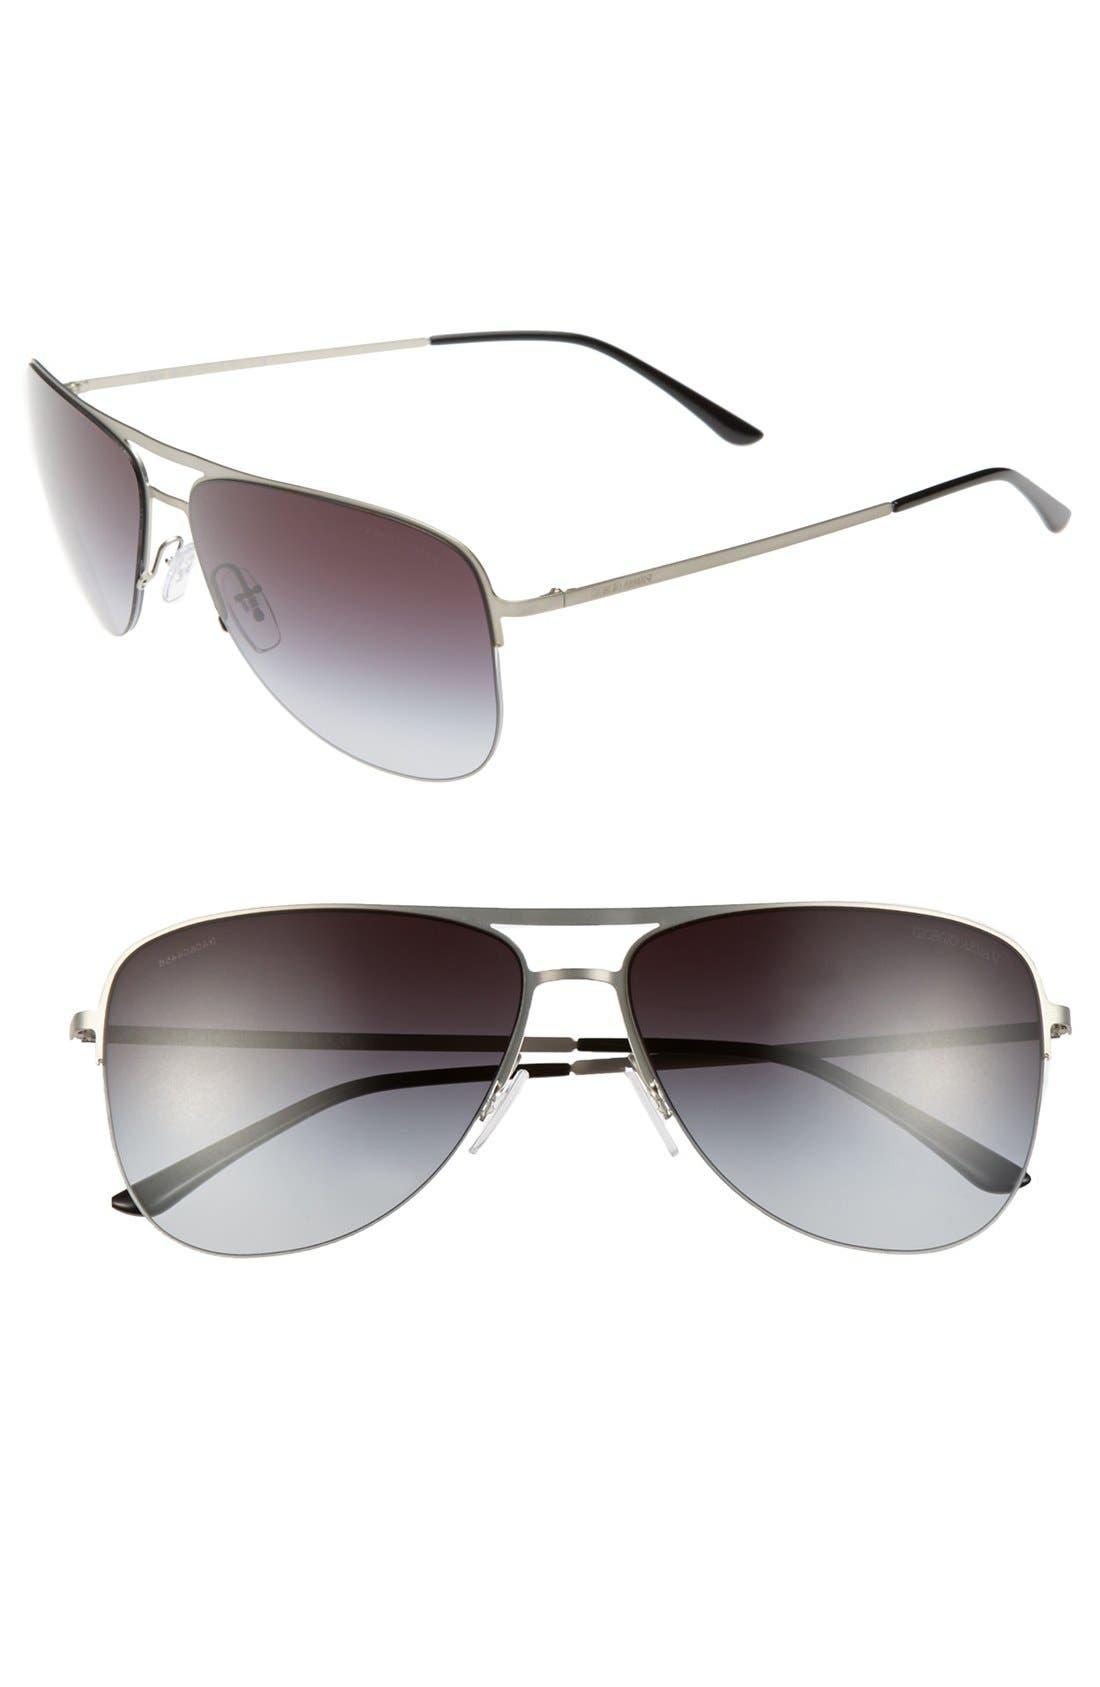 Alternate Image 1 Selected - Giorgio Armani 60mm Aviator Sunglasses